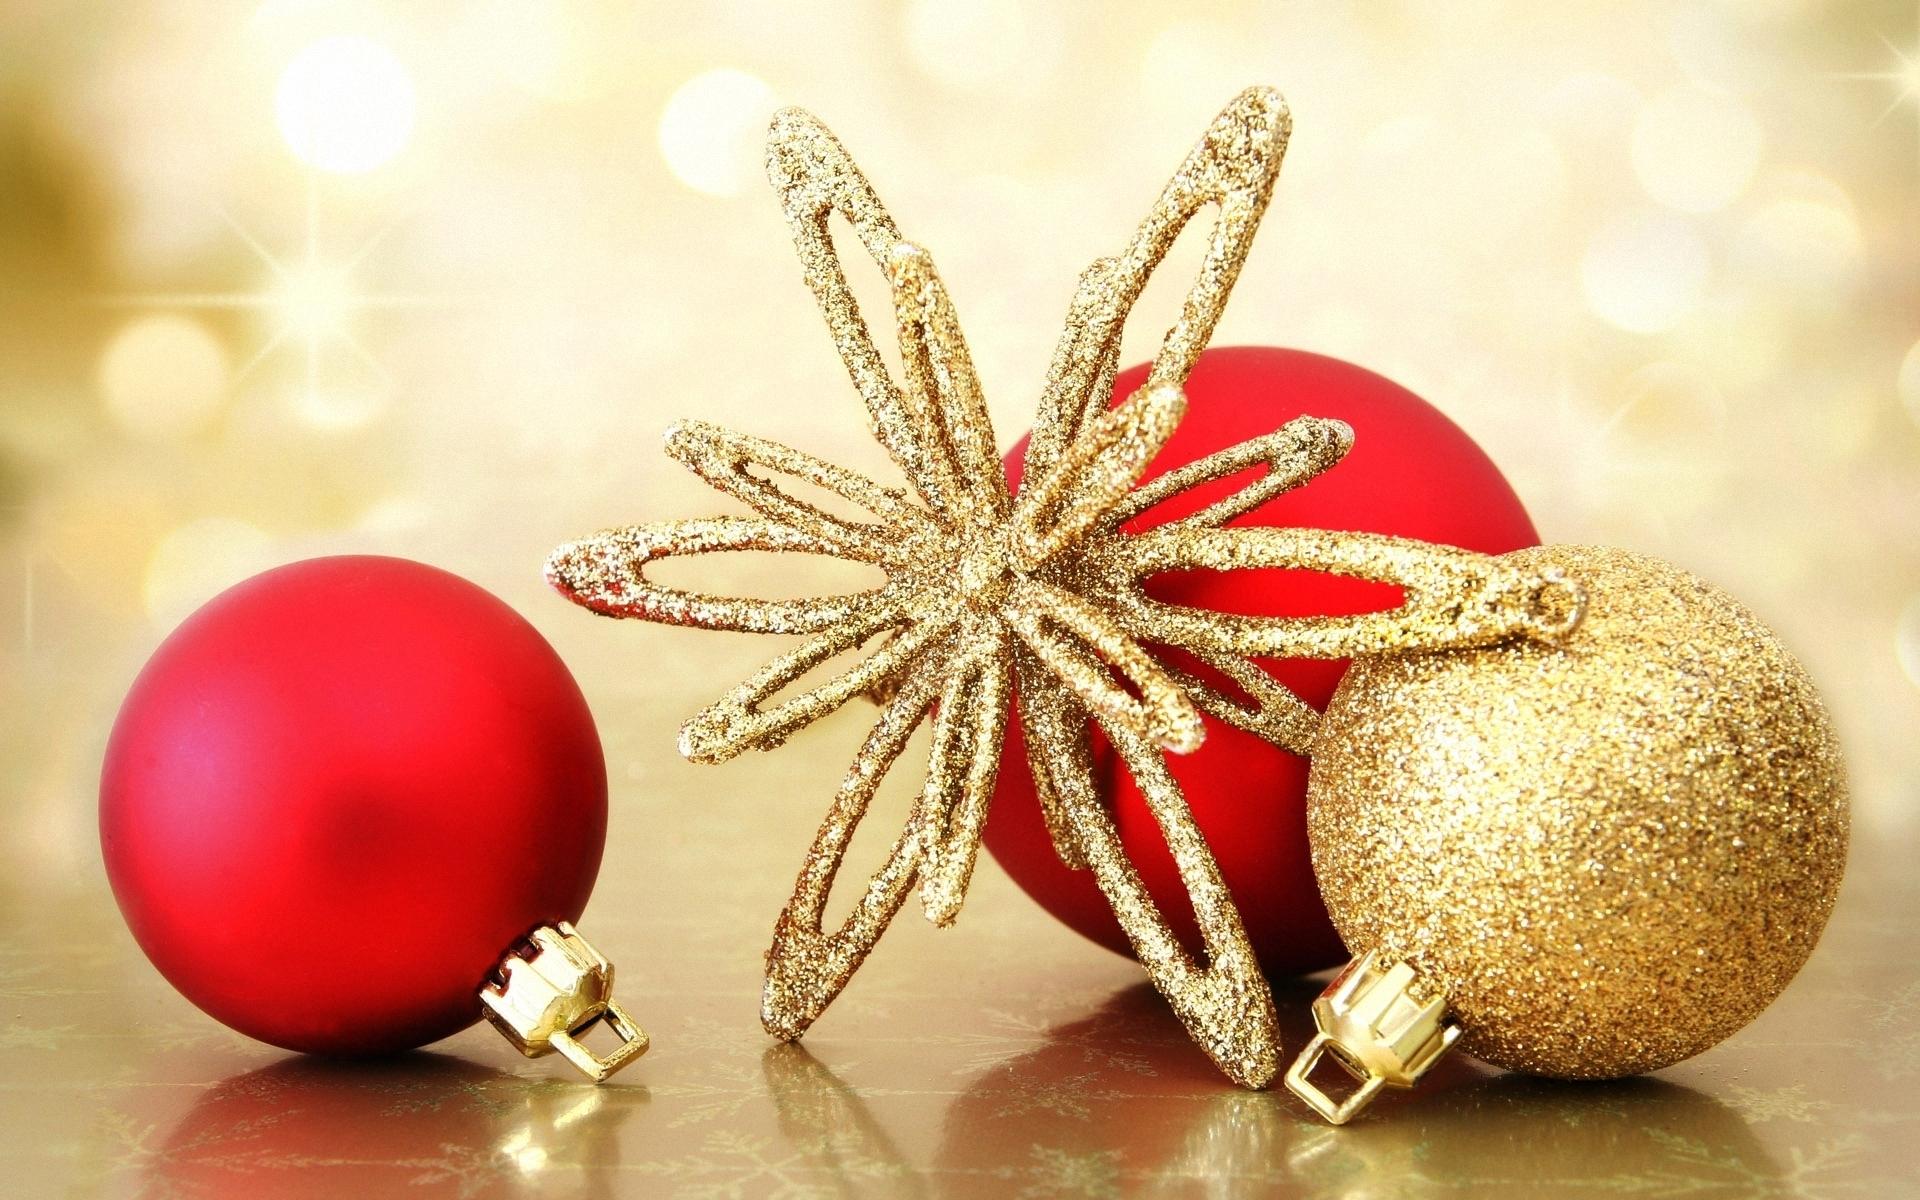 Image: Snowflake, balls, gold, red, holiday, new year